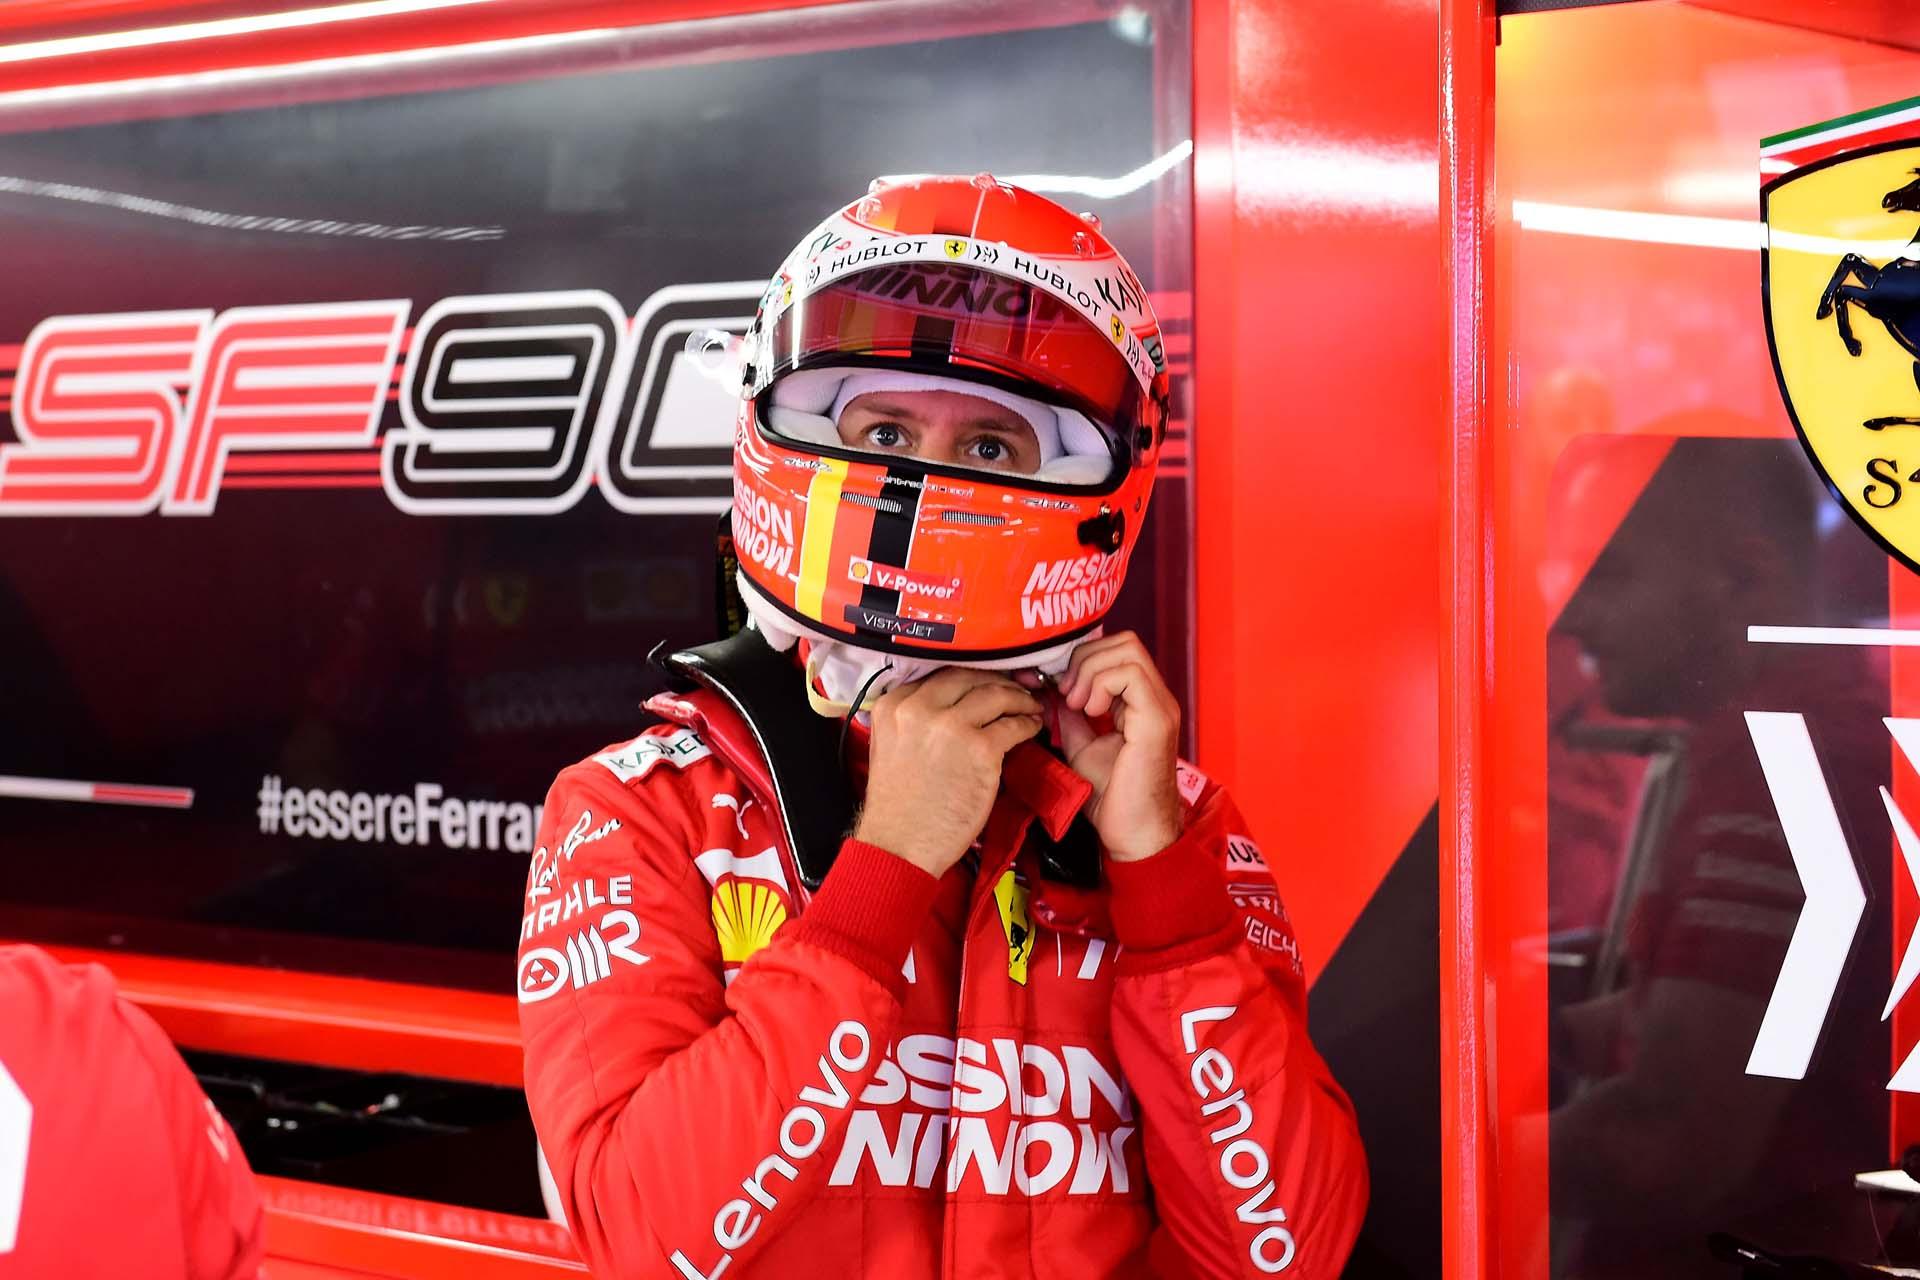 GP MONACO F1/2019 - GIOVEDÌ 23/05/2019